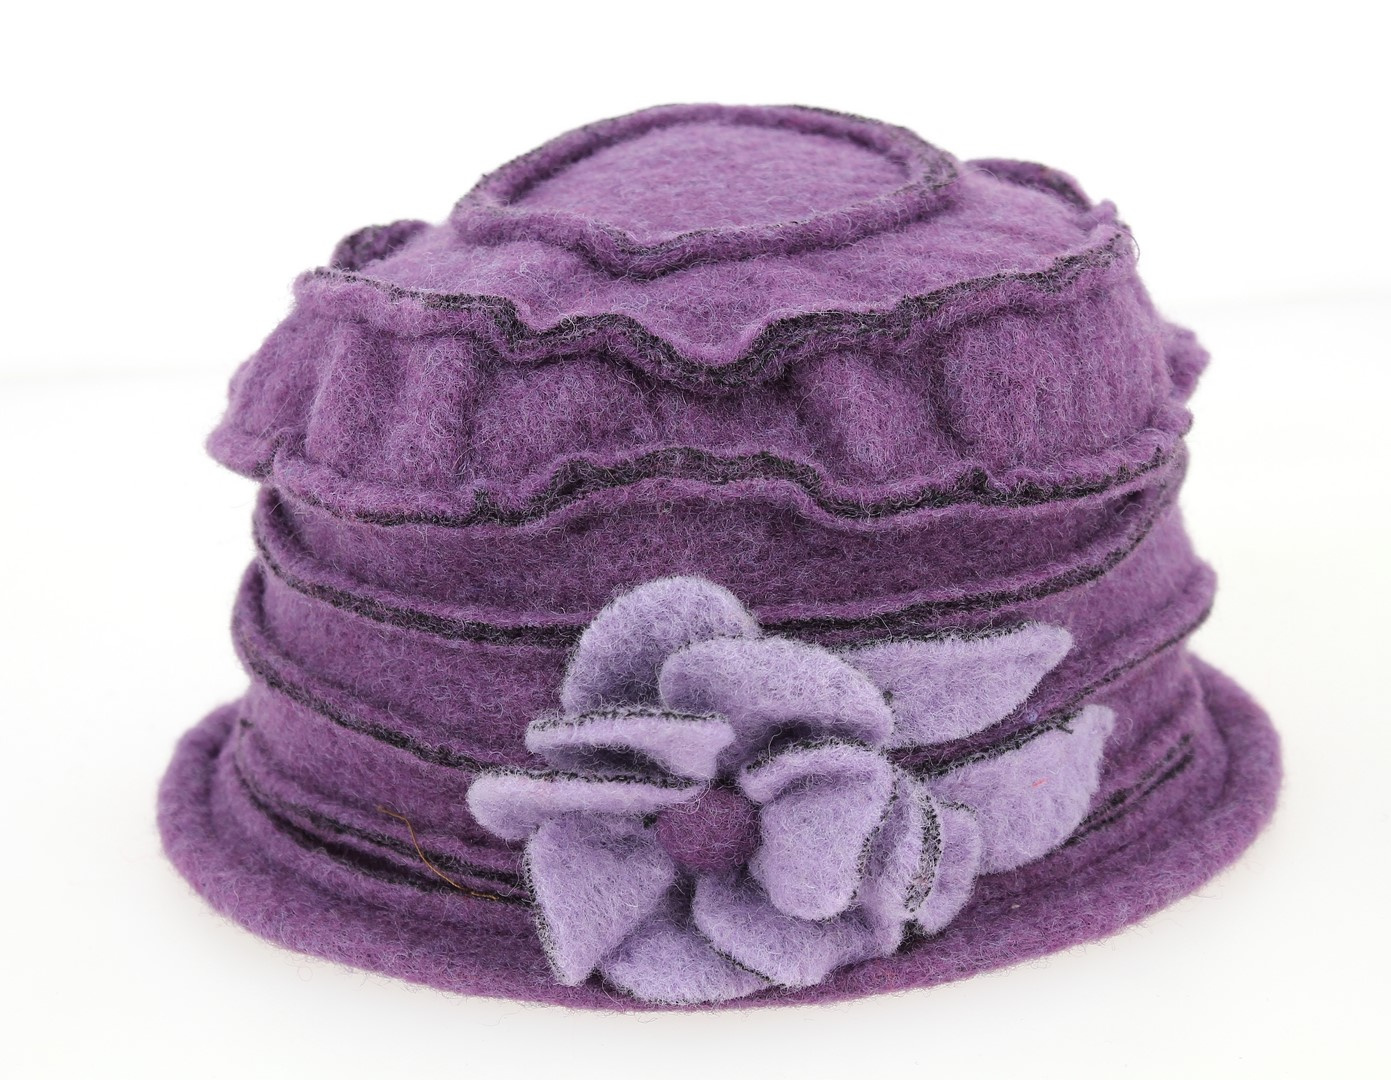 Lilas lavande violet clair Argent Plumes Coiffe 1920 S Headband Vintage 4268